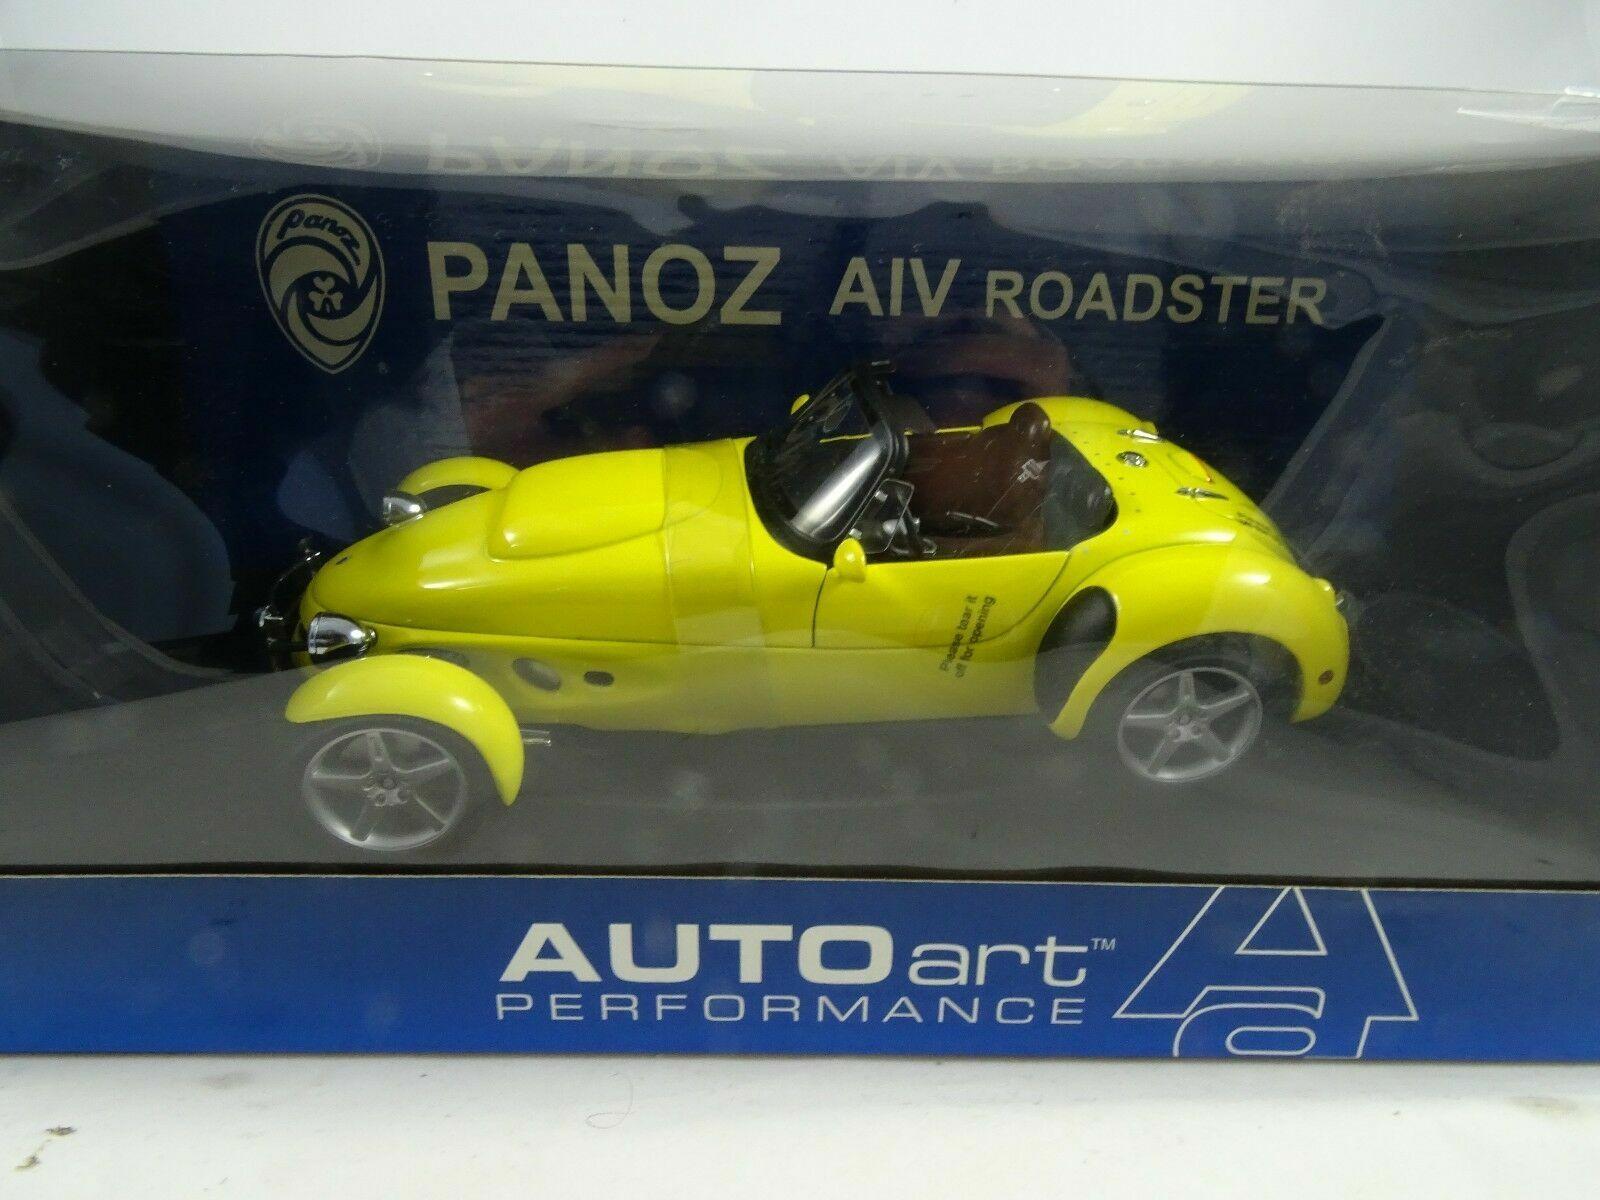 1 18 AUTOart 78213 Panoz AIV Roadster 1998 Gelb - Neu OVP